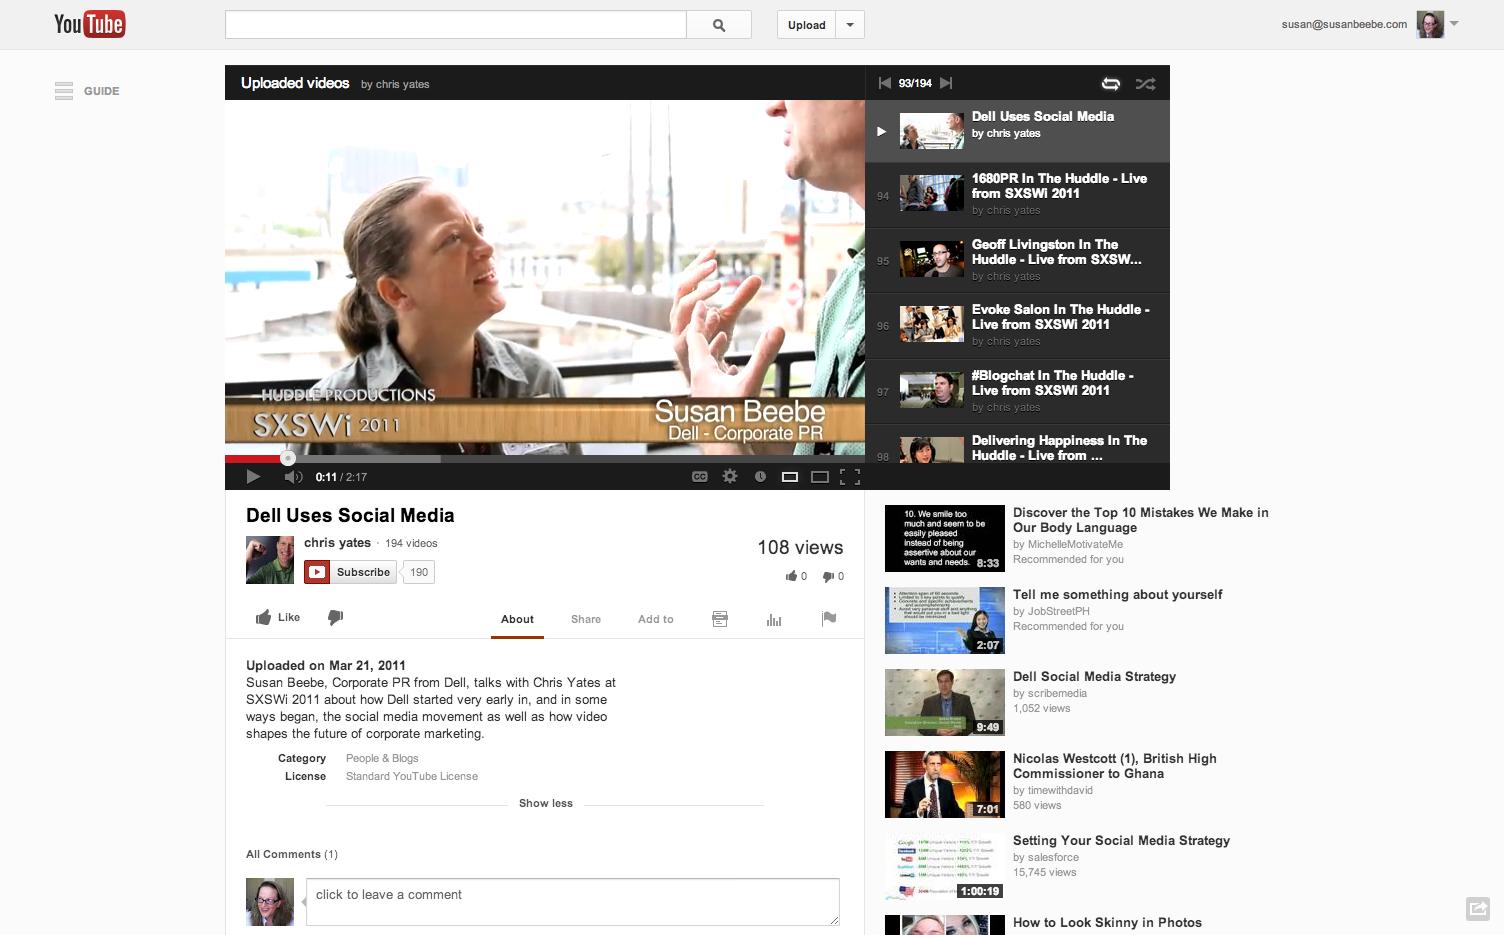 VIDEO: Susan Beebe at SXSW 2011 re Dell social media.